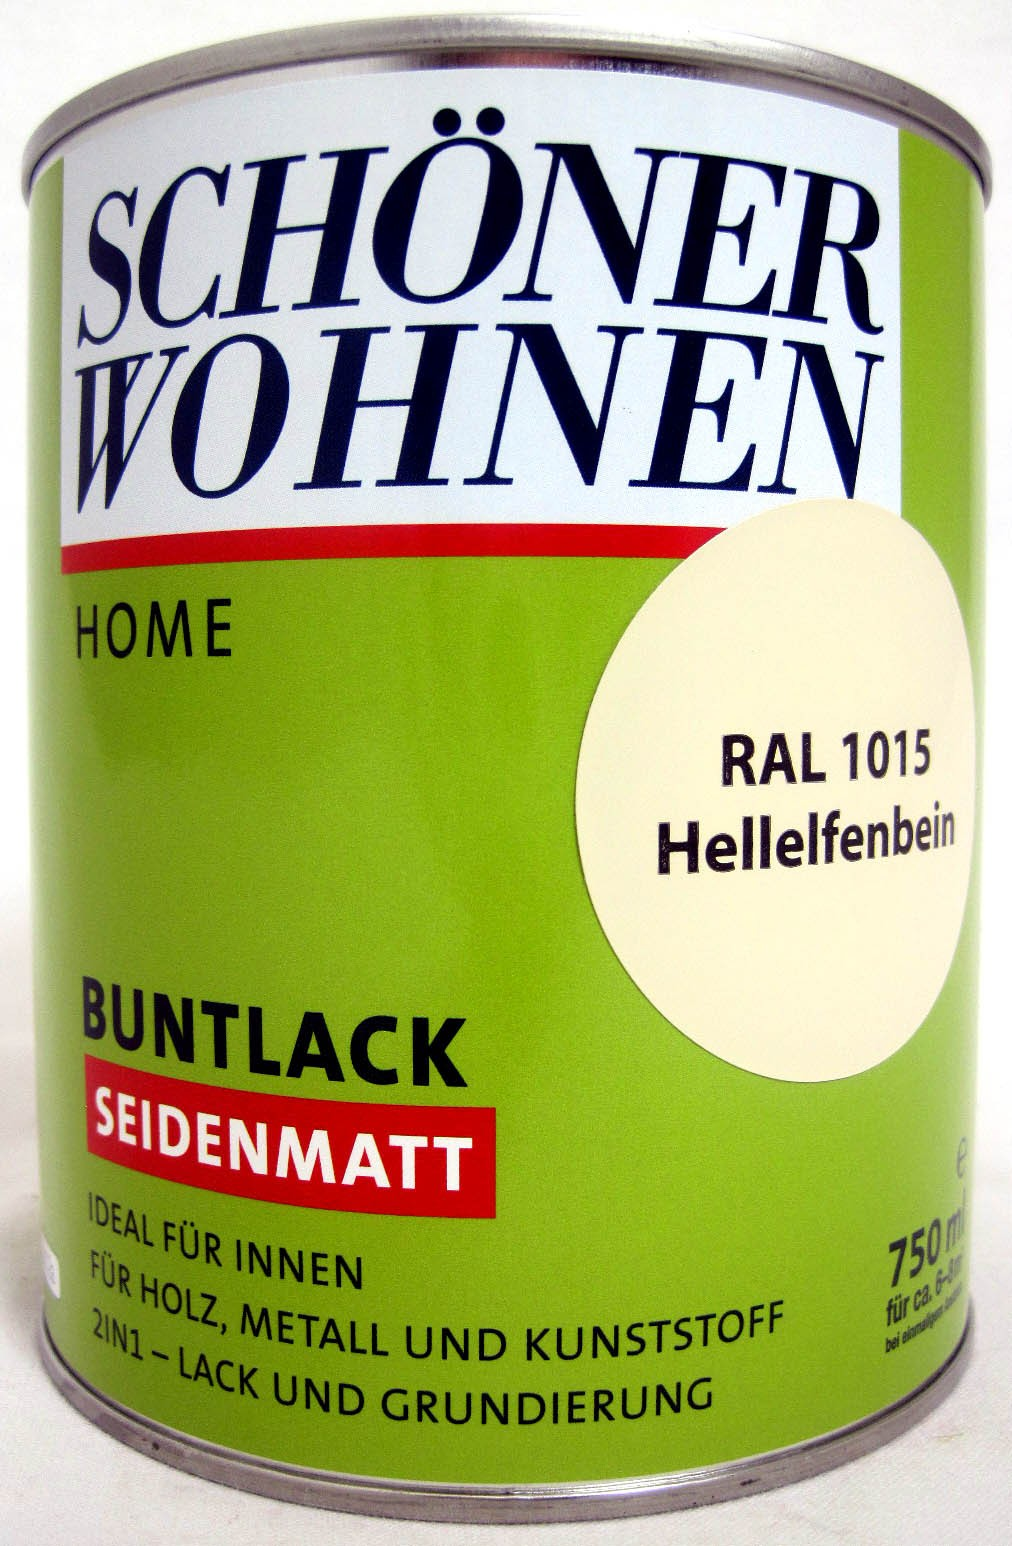 Home Buntlack - Acryllack, seidenmatt, RAL 1015 Hellelfenbein, 750 ml